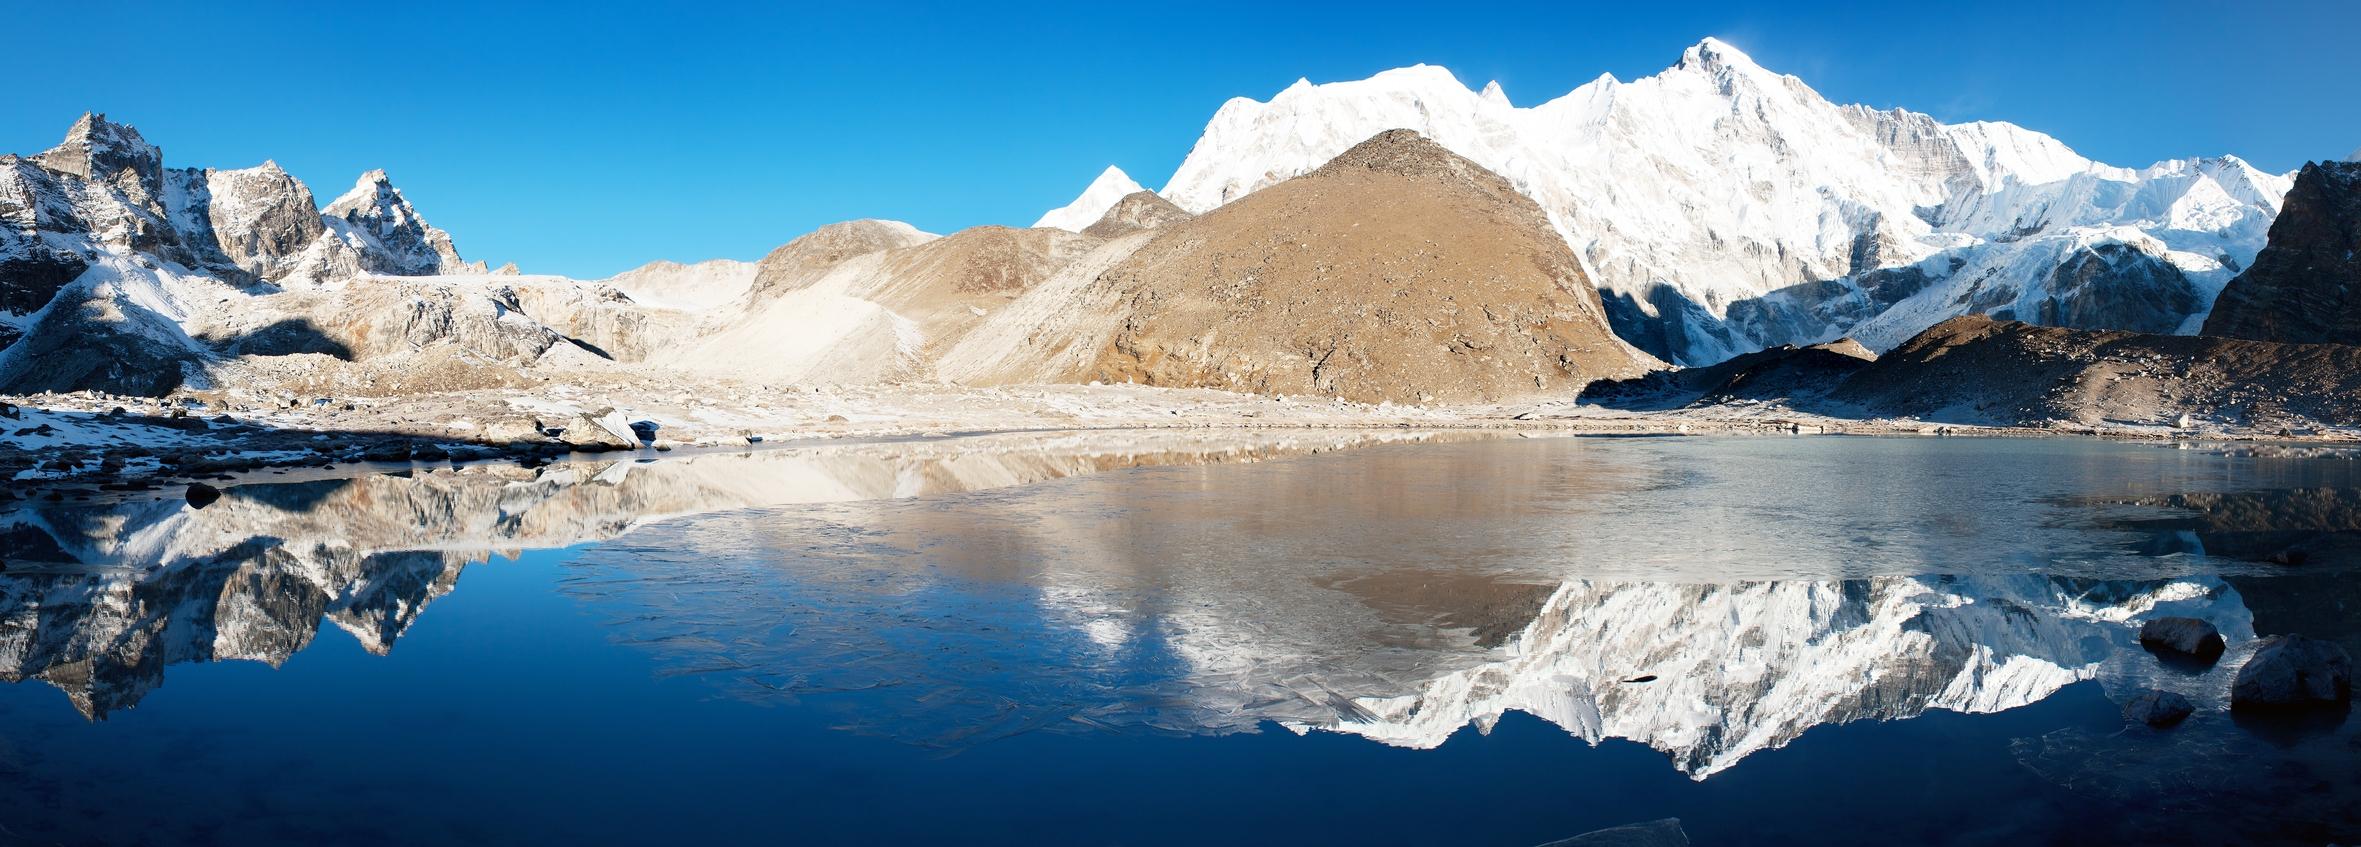 Гималаи-Эверест